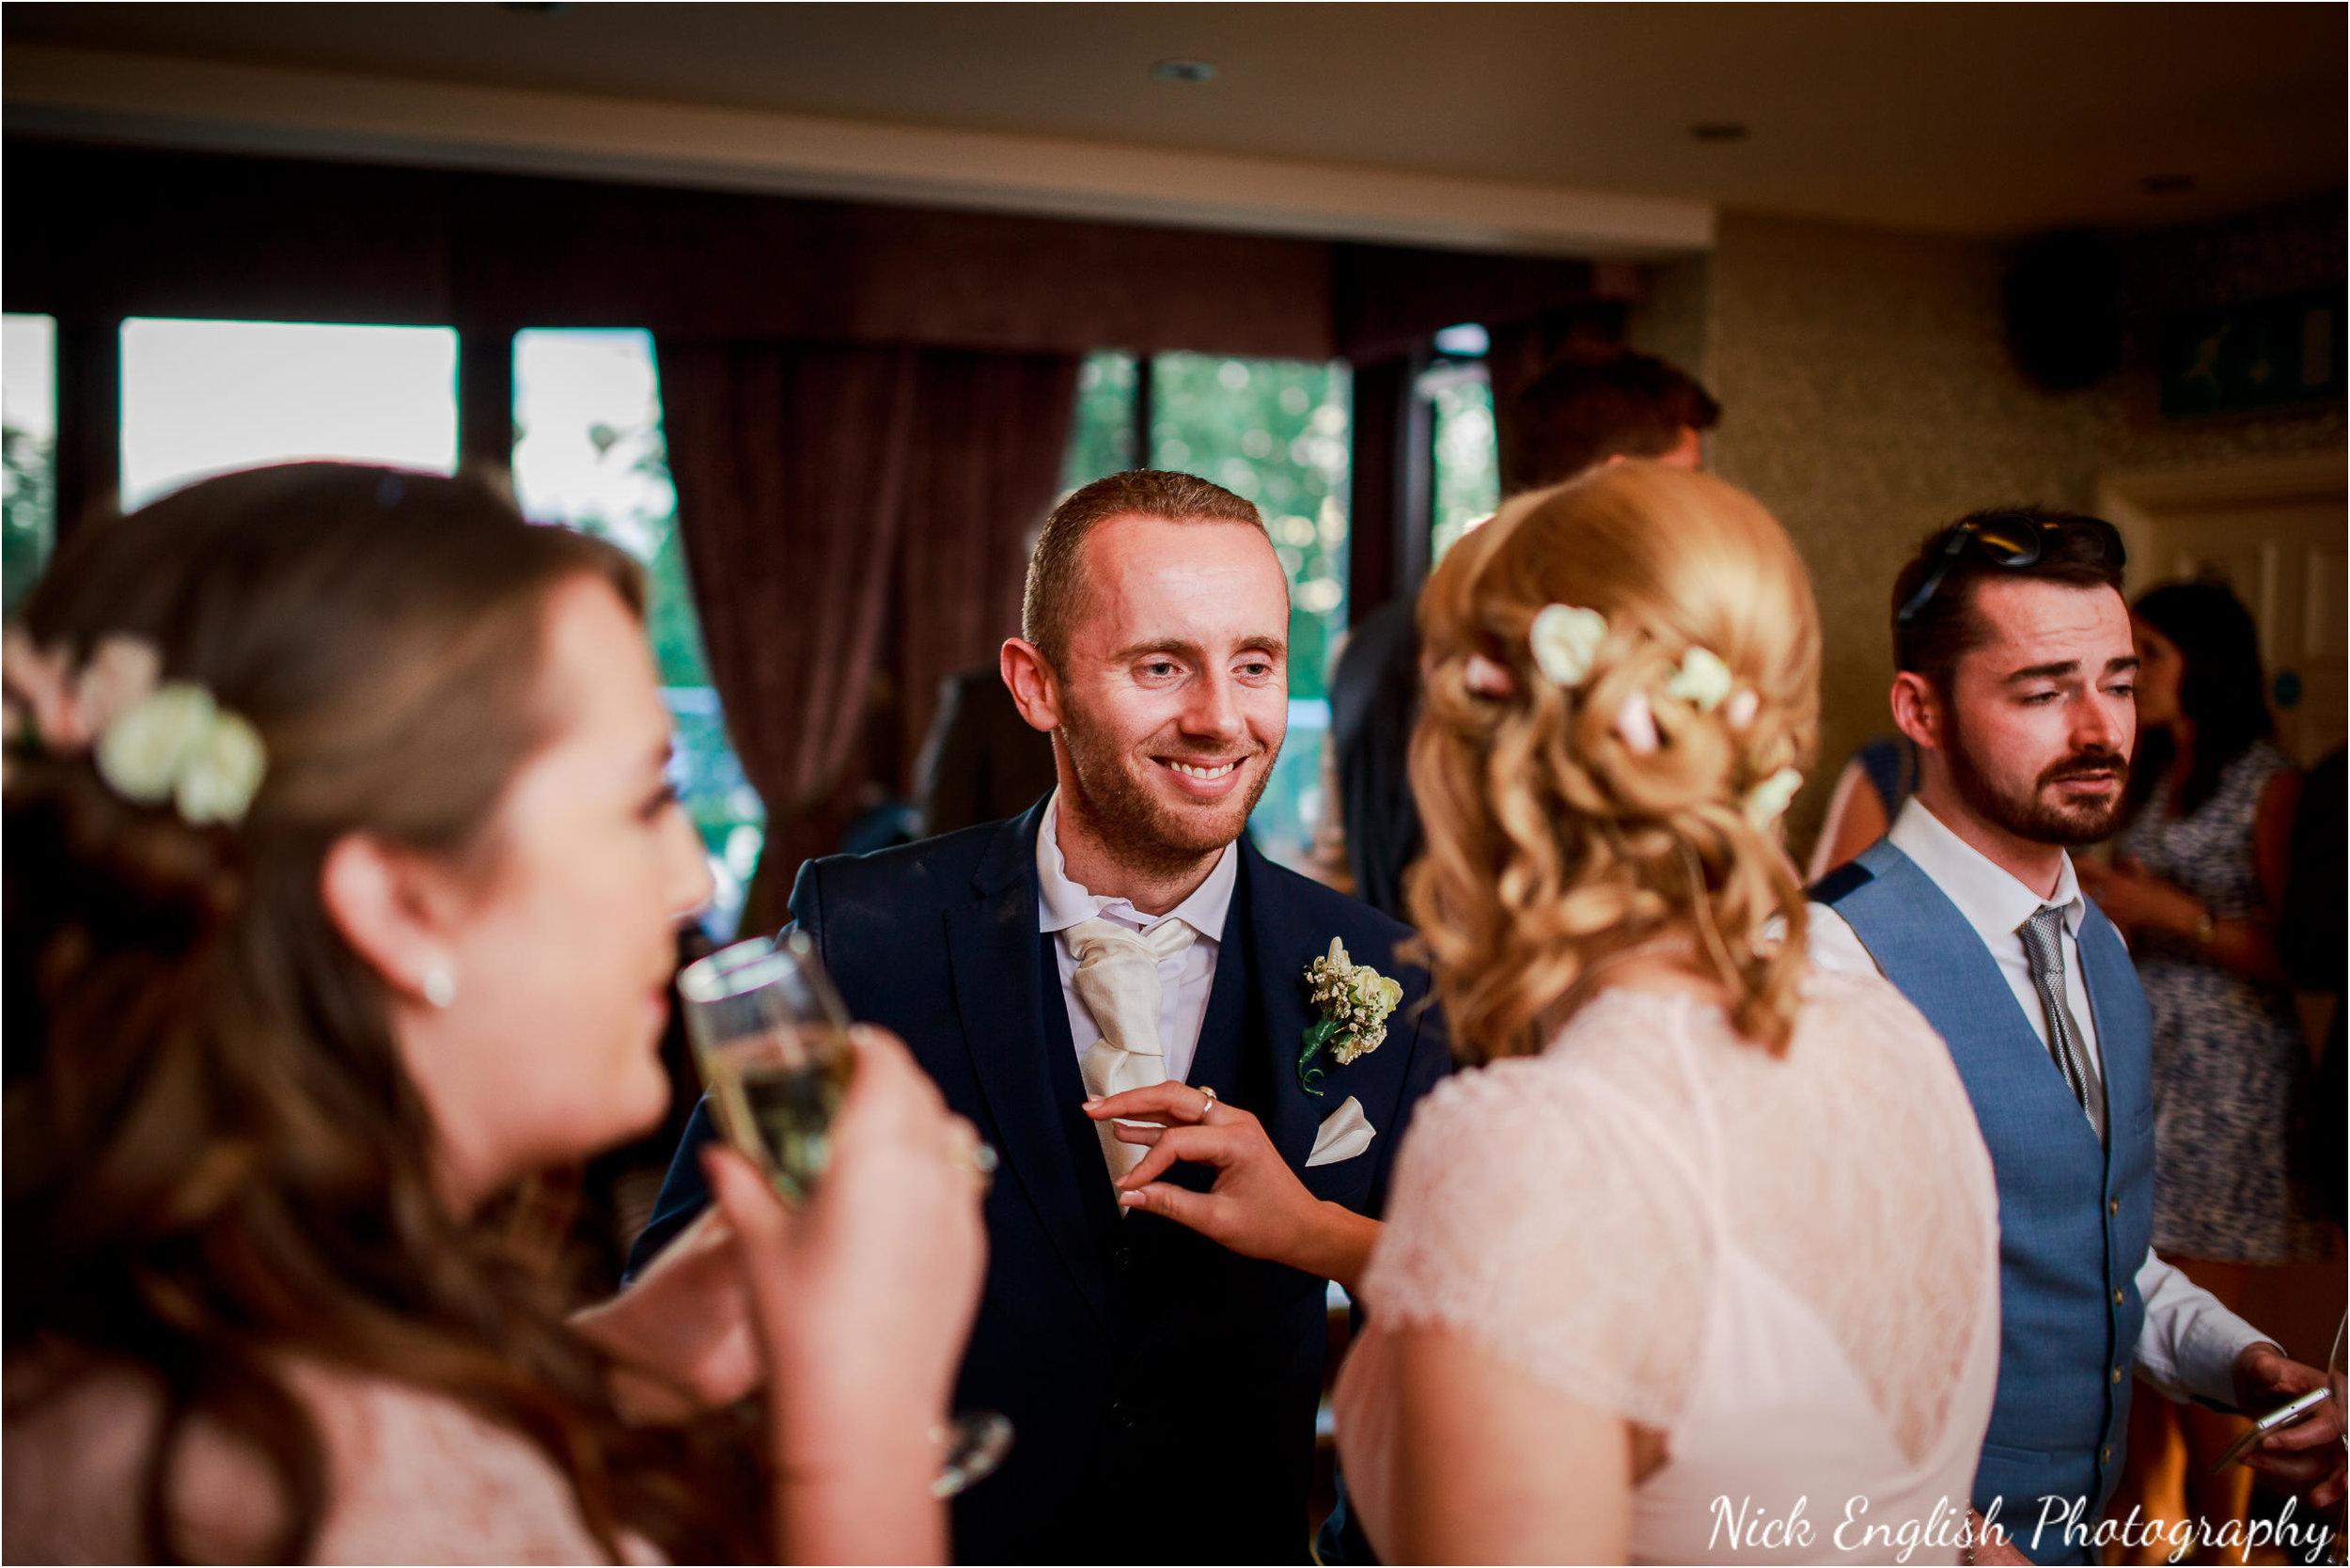 Emily David Wedding Photographs at Barton Grange Preston by Nick English Photography 206jpg.jpeg